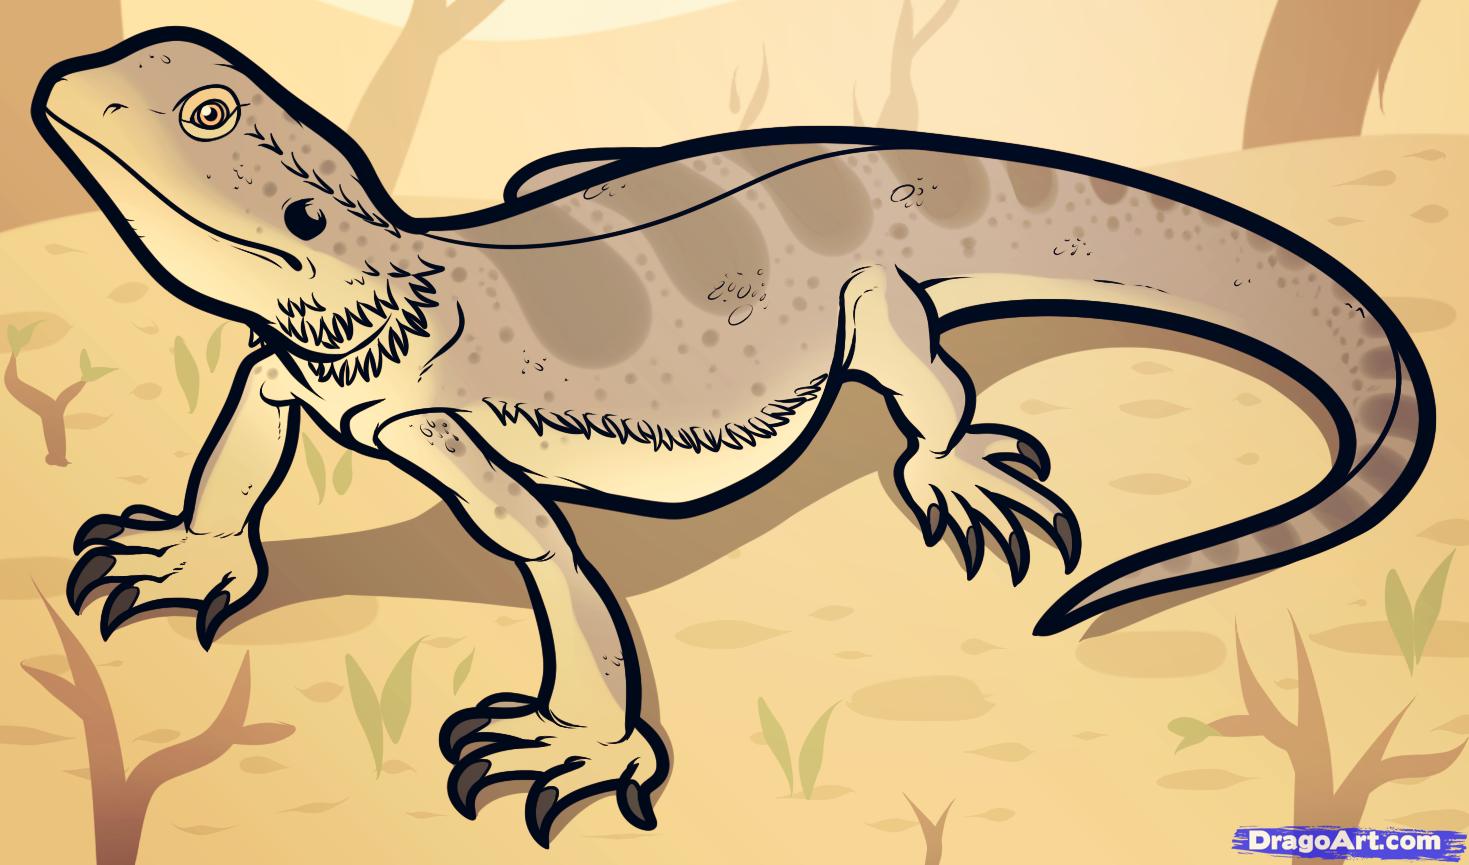 Drawn reptile bearded dragon To Tattoos Bearded Dragon How